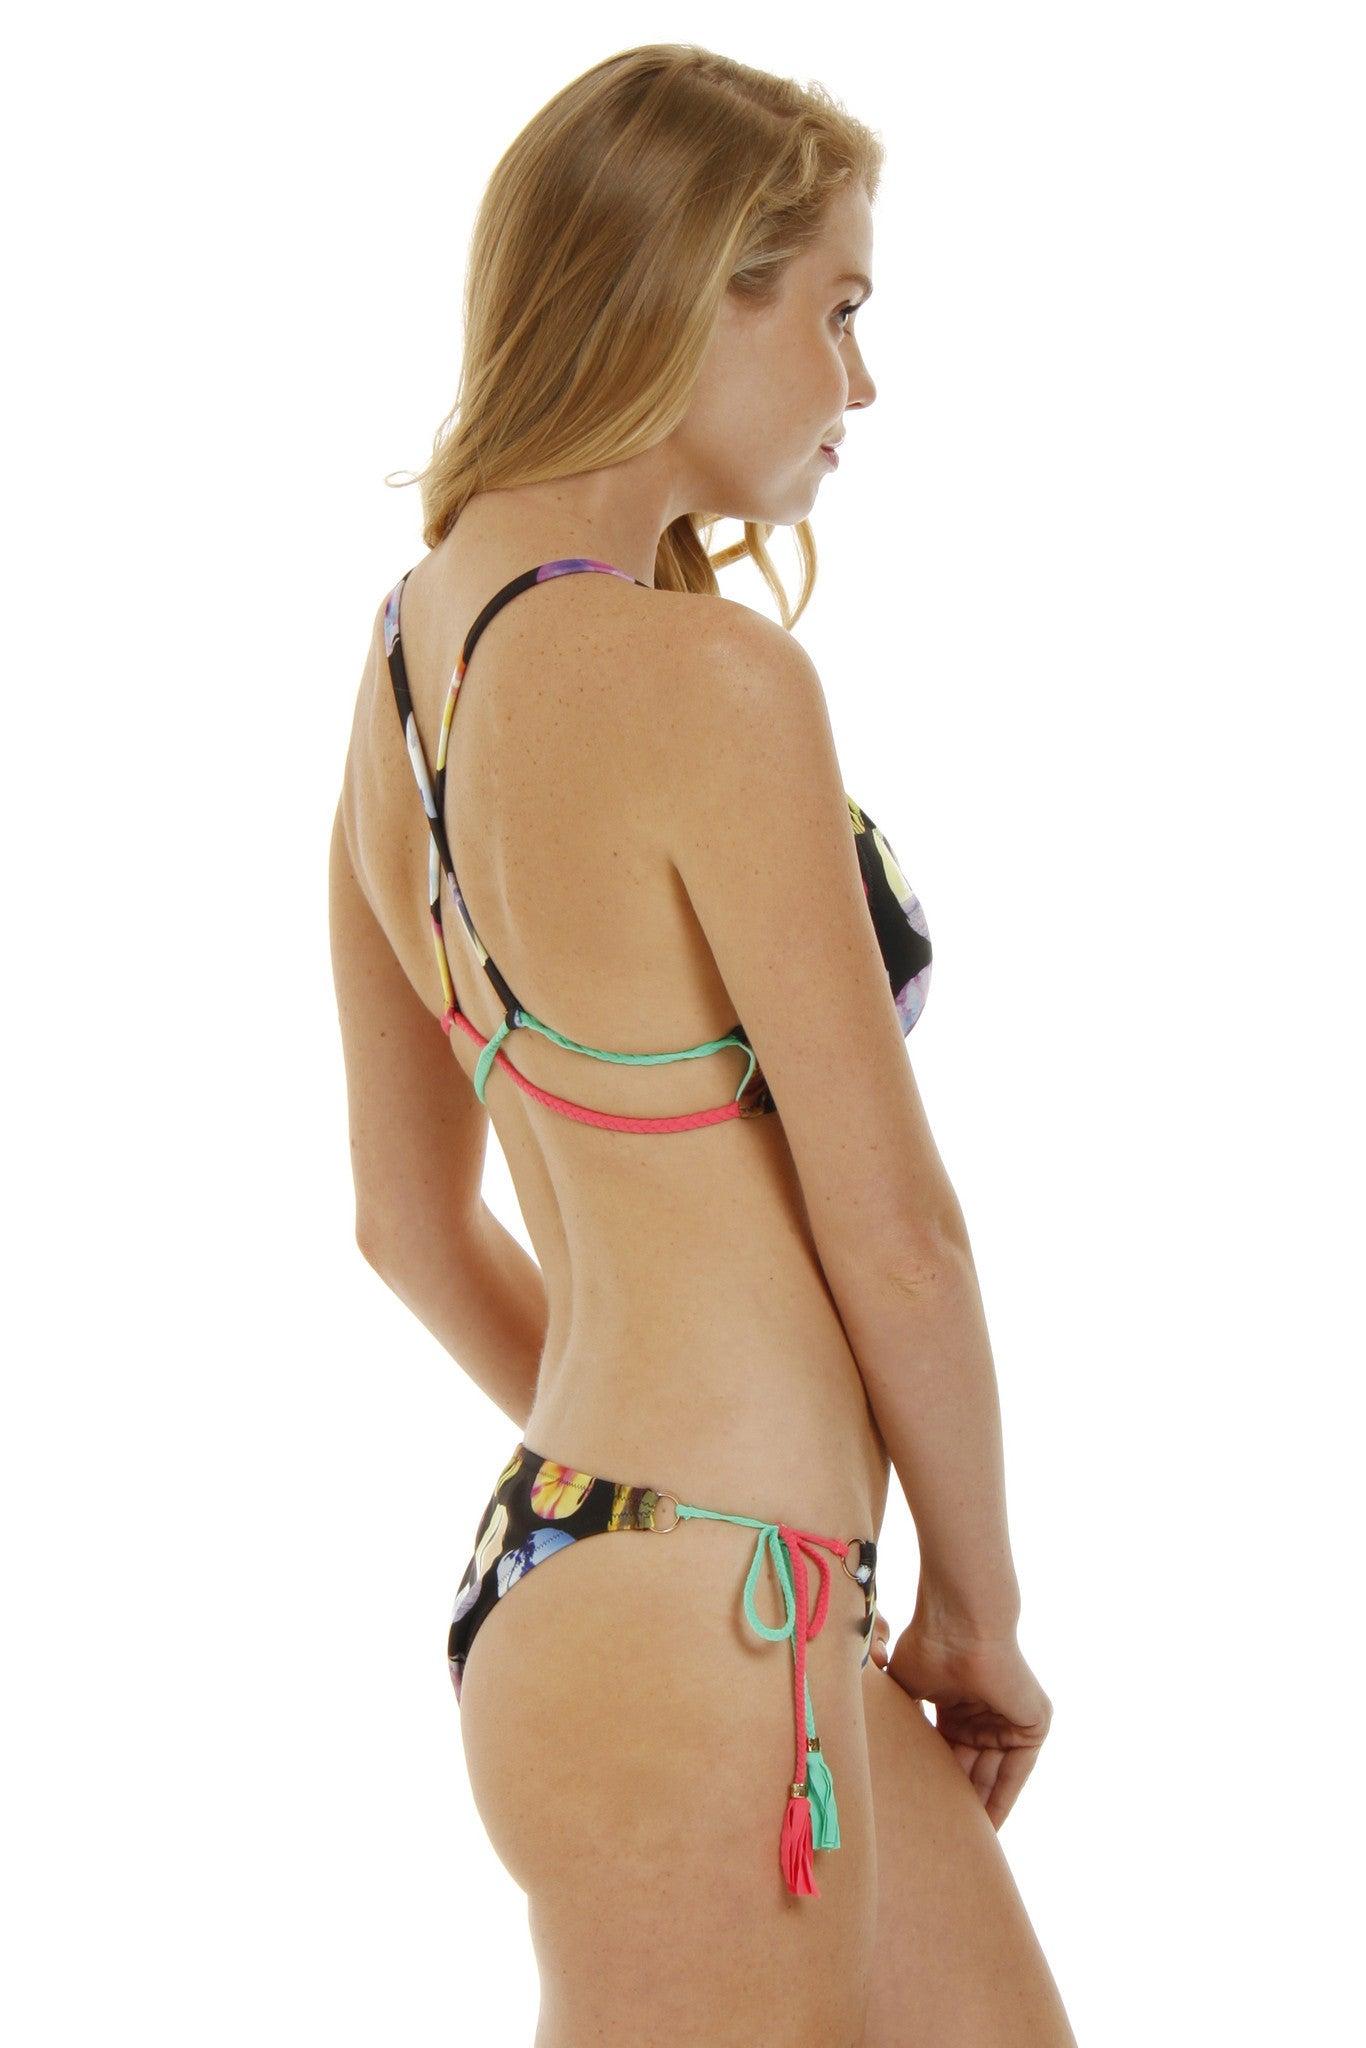 RAISINS Stringer Cheeky Bikini Bottom - Cali Coast Print Bikini Bottom | Cali Coast Print| Raisins Stringer Cheeky Bikini Bottom - Cali Coast Print. Side View. Side Ties. Adjustable Fit. Cheeky Coverage.